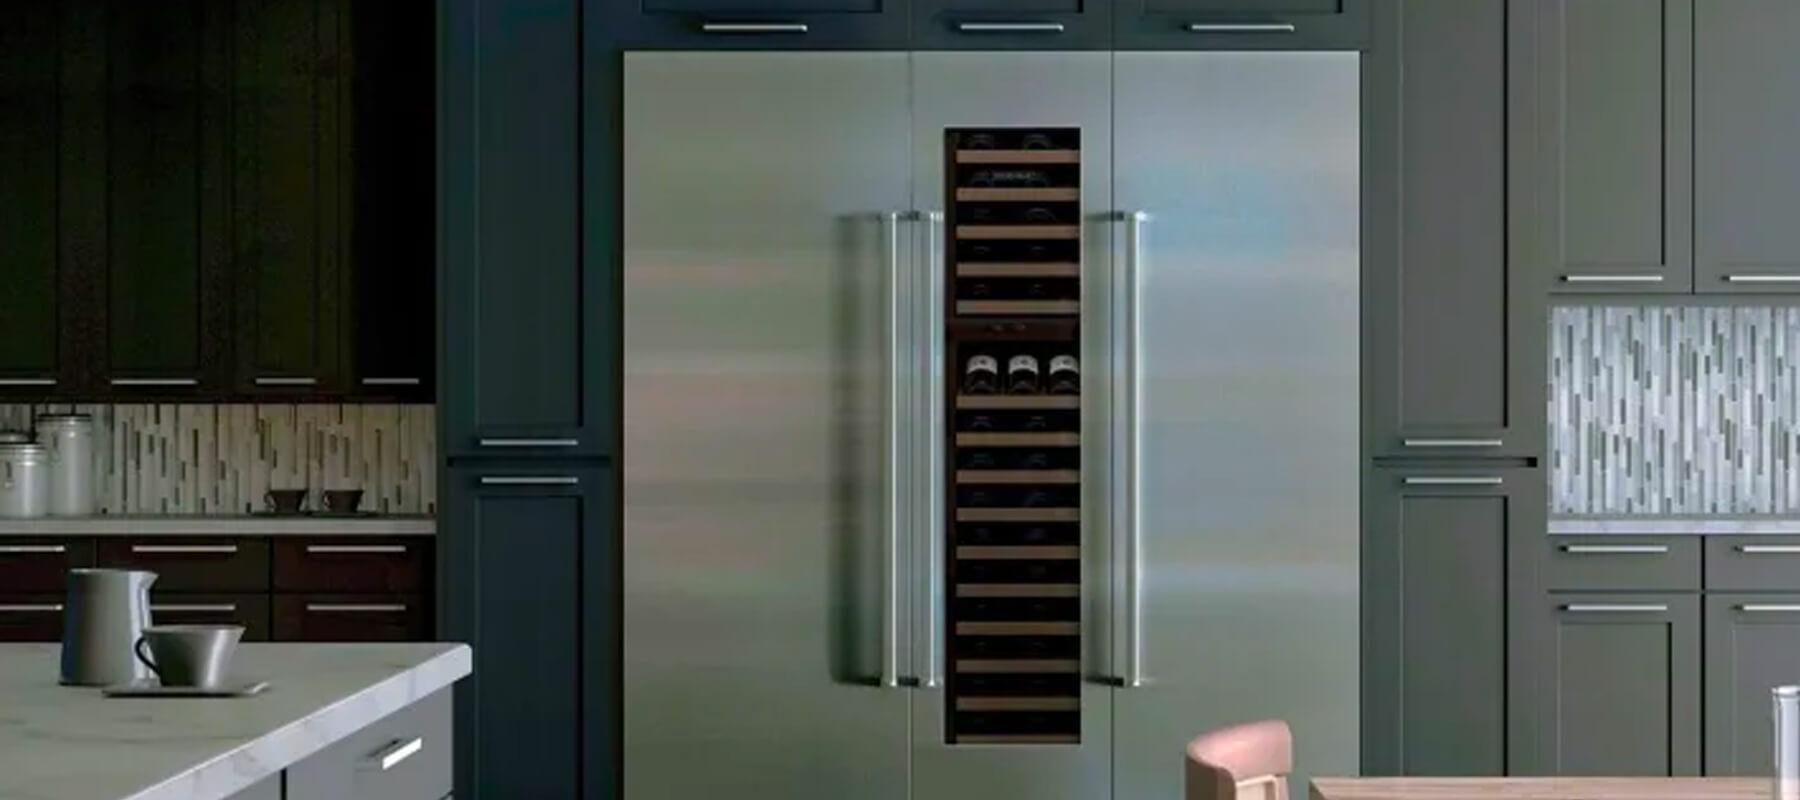 Built in Counter Depth Refrigerator Beverly Hills | Built-in Refrigerator Repair